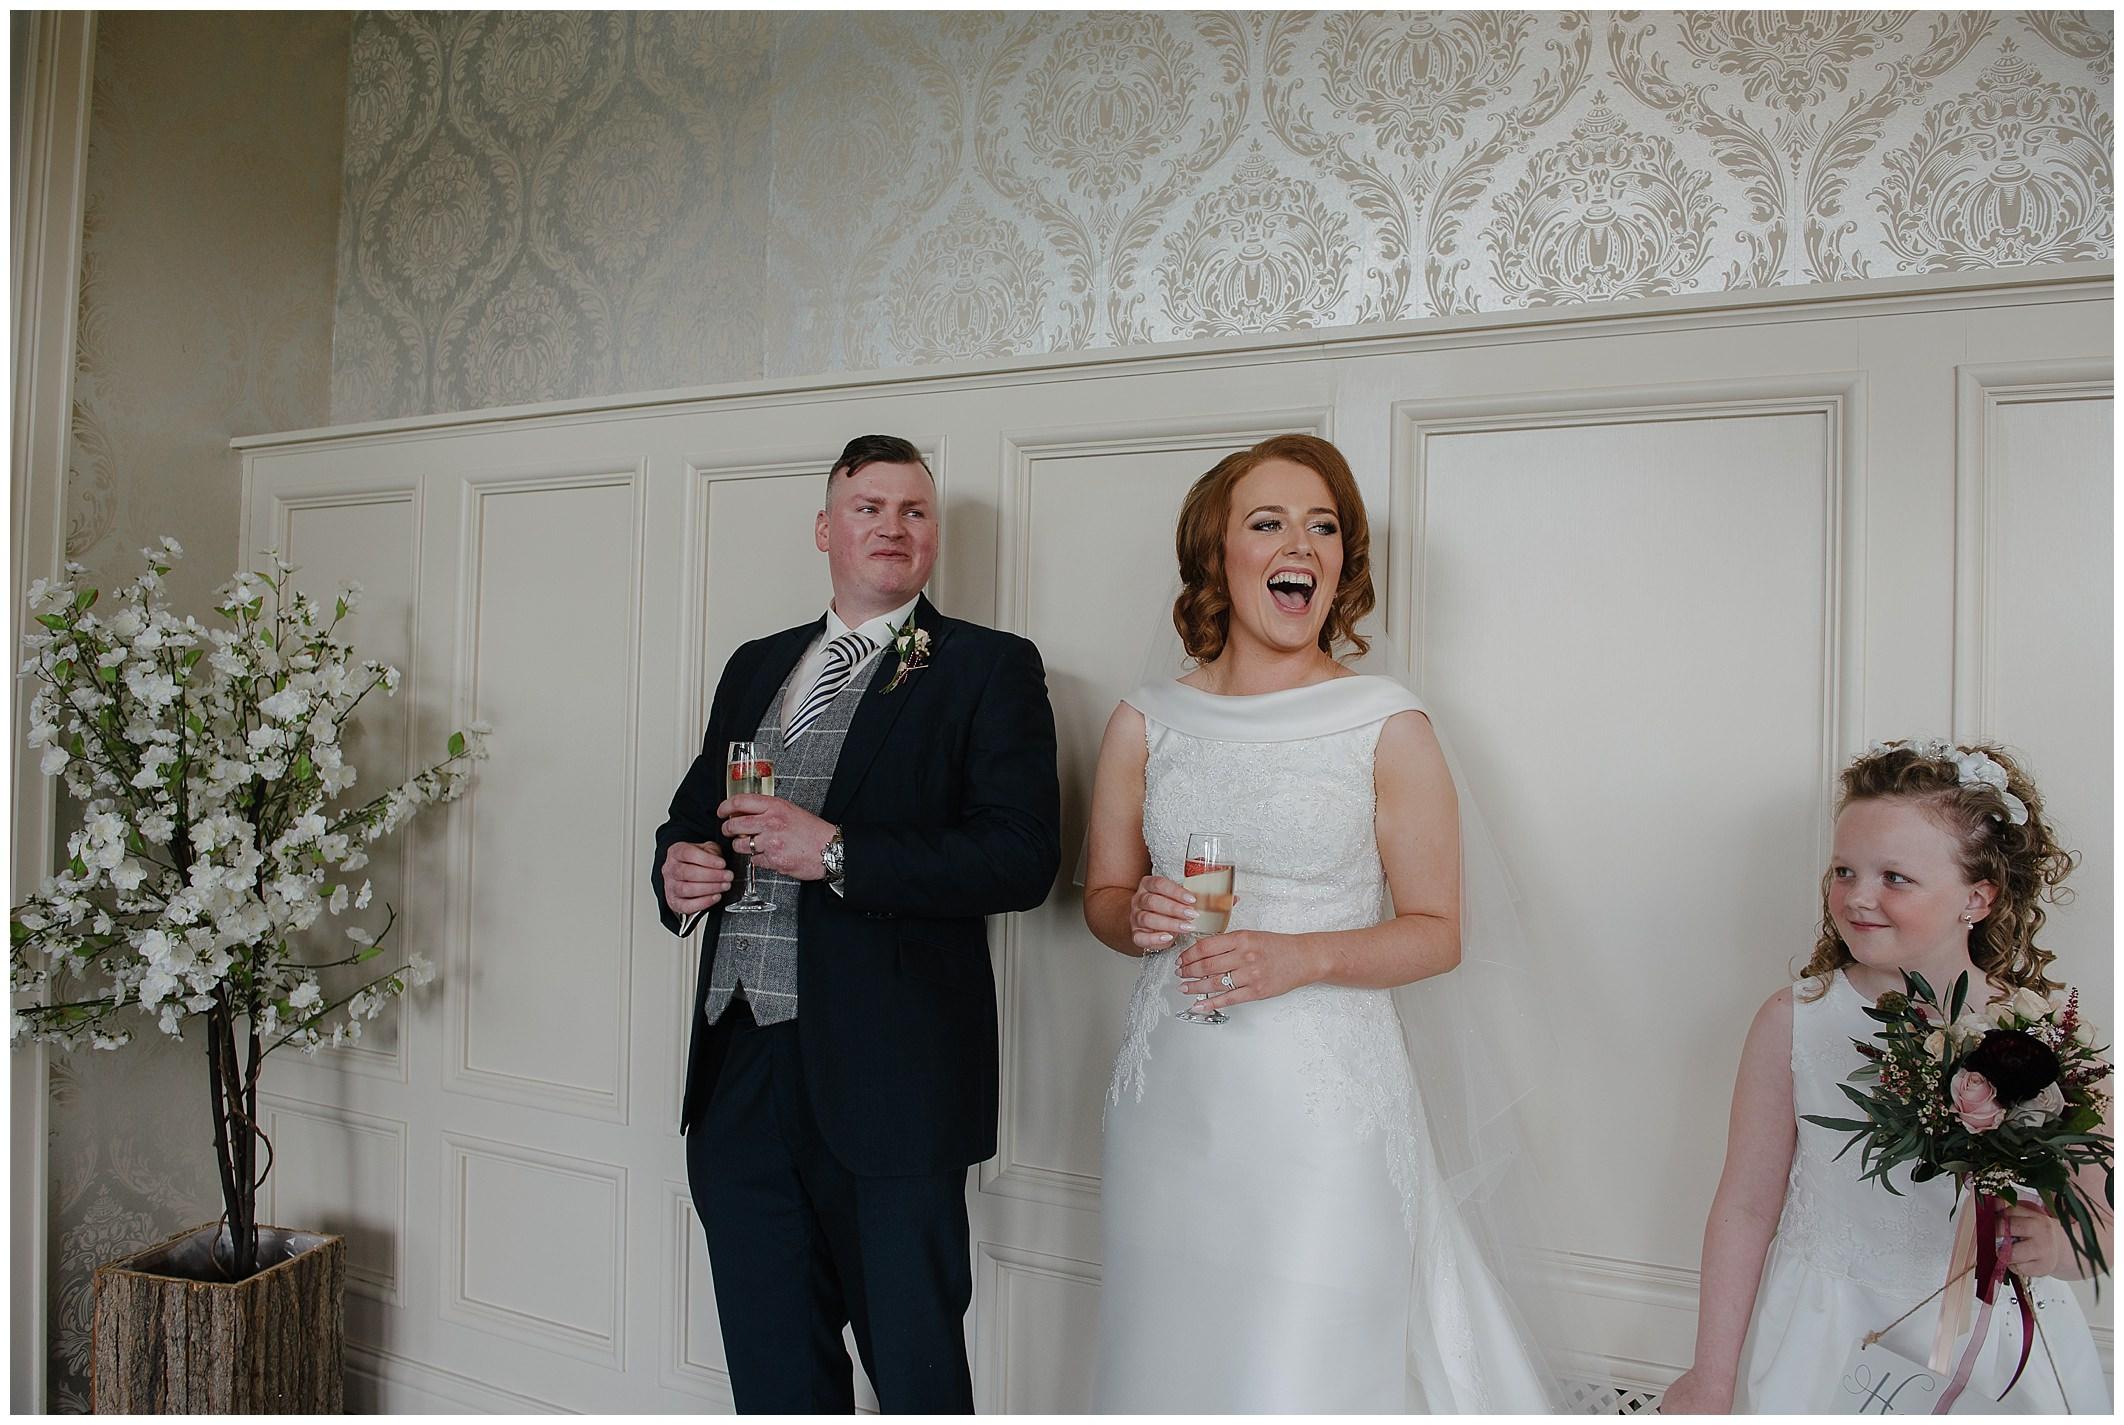 corick-house-wedding-hannah-gary-jude-browne-photography_0045.jpg